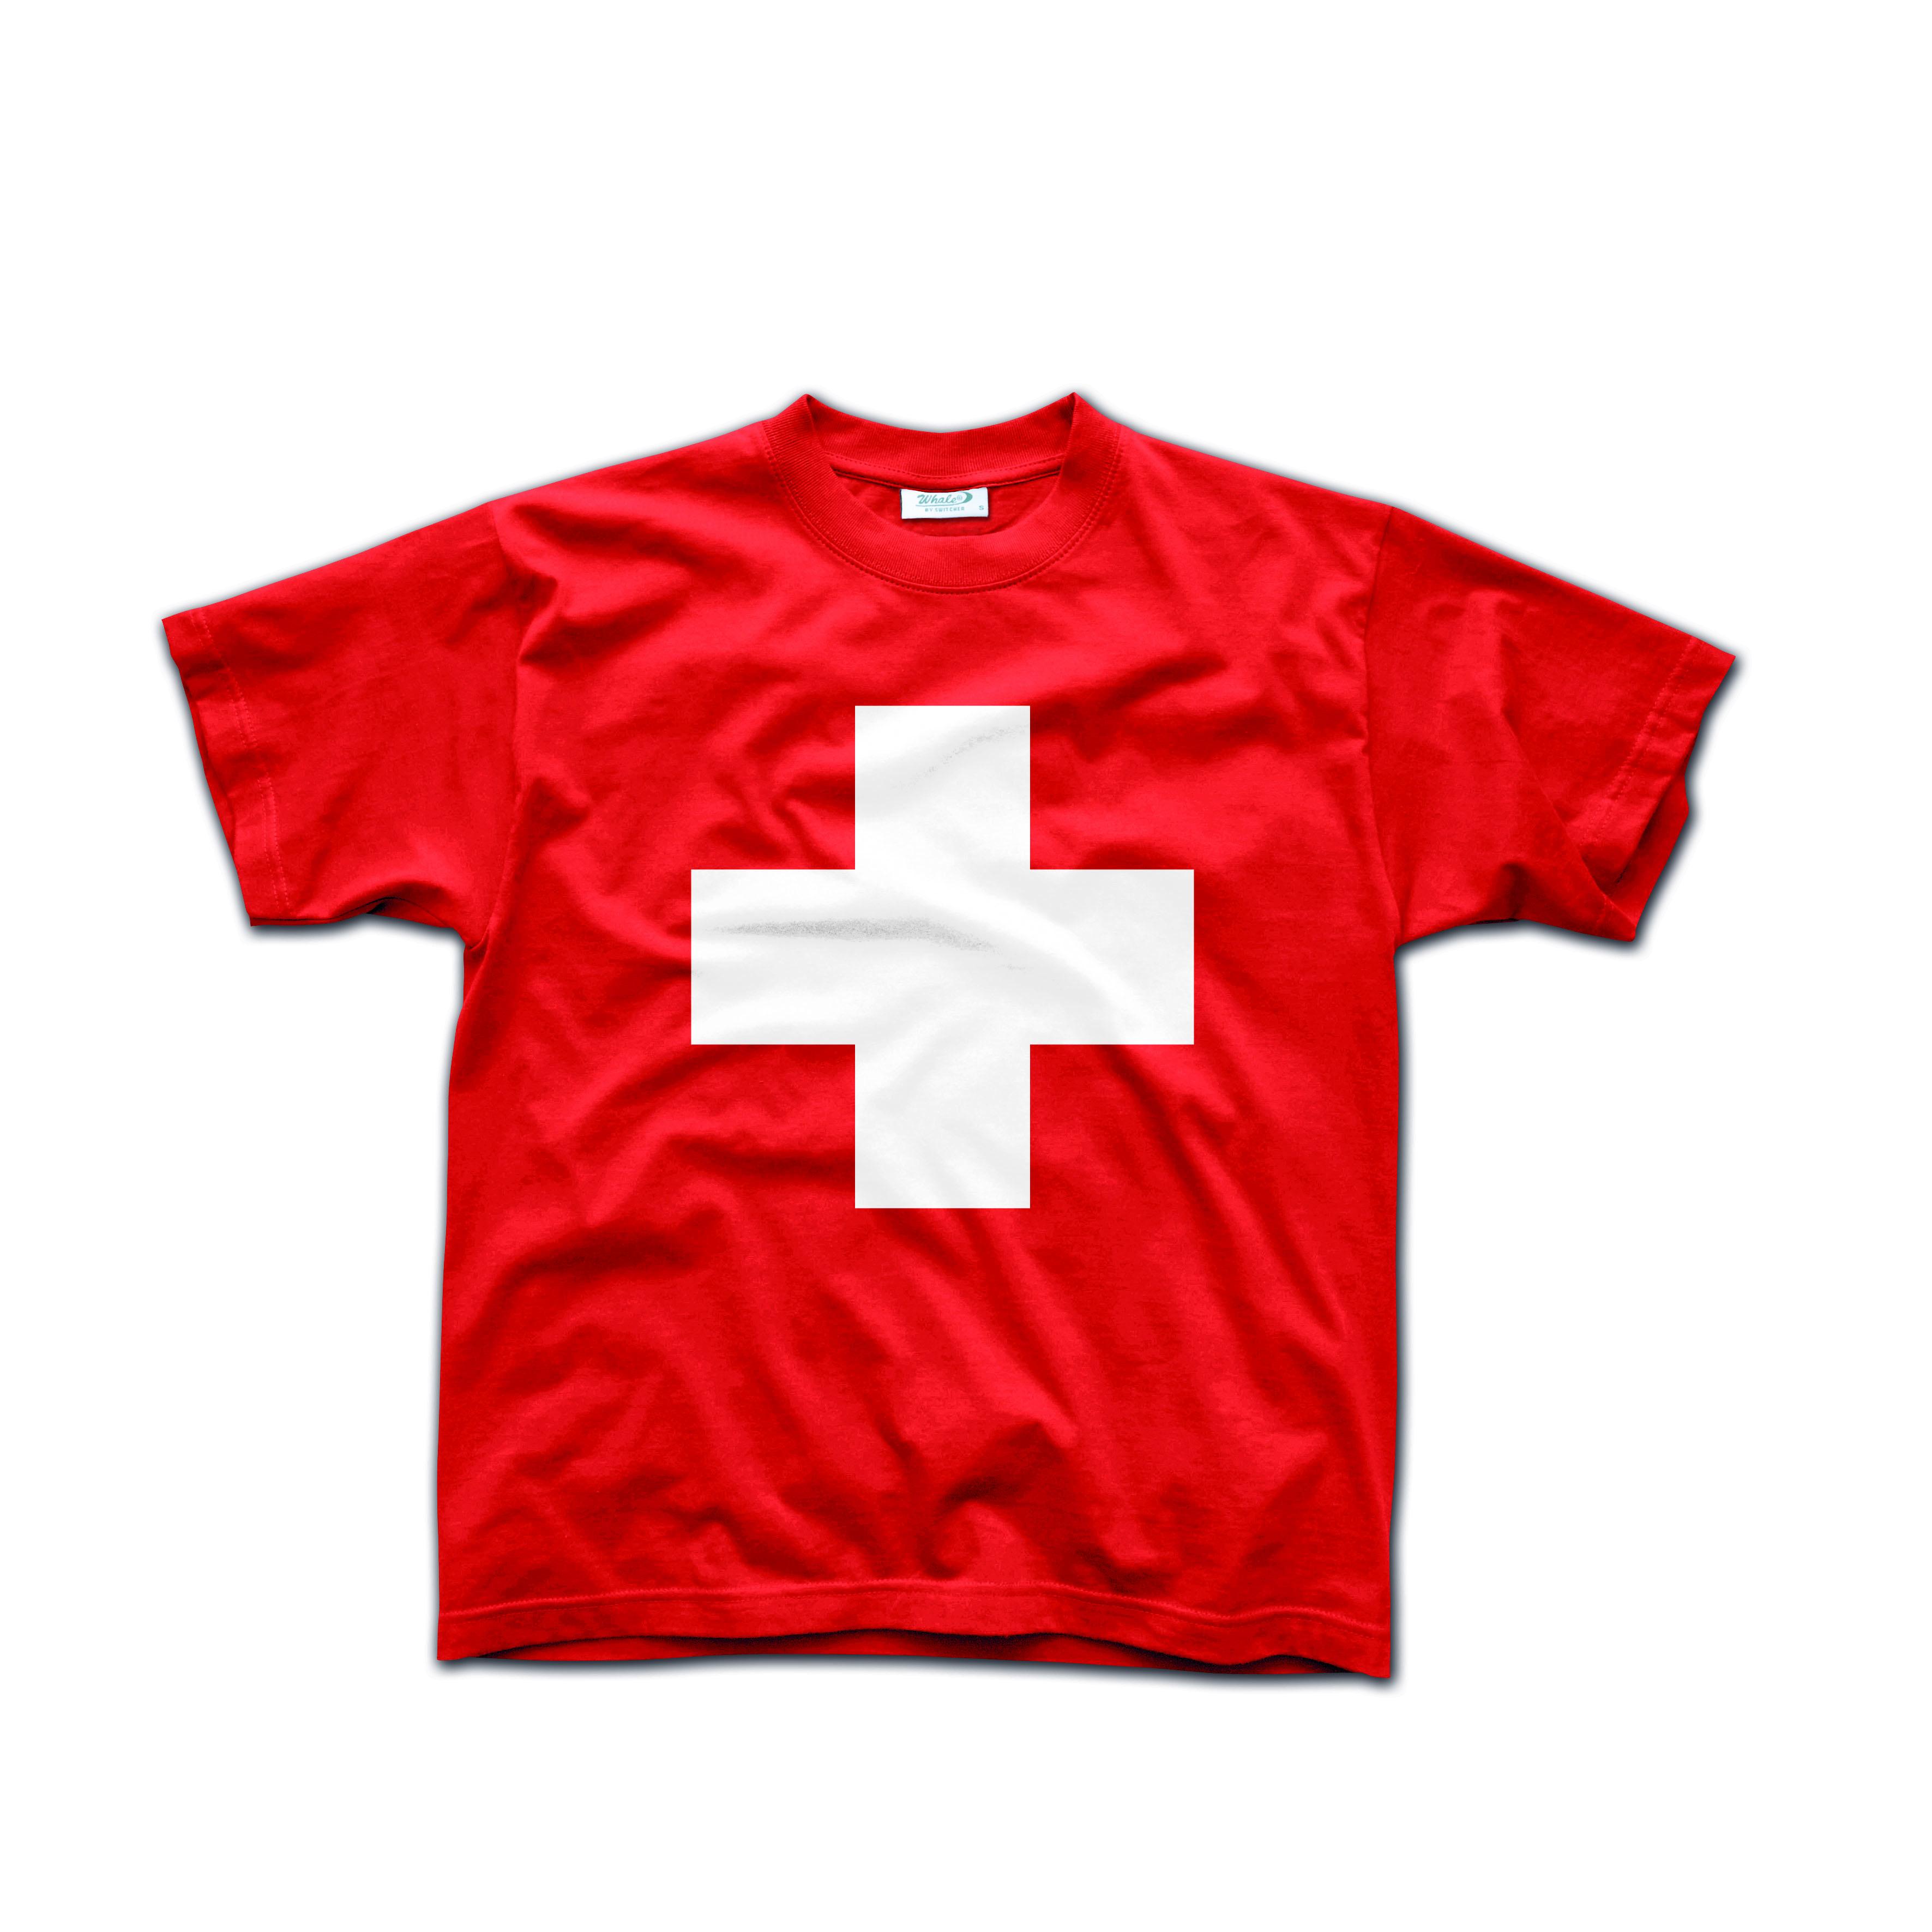 Helvetica T Shirt T Shirts Amp More Souvenir Amp More